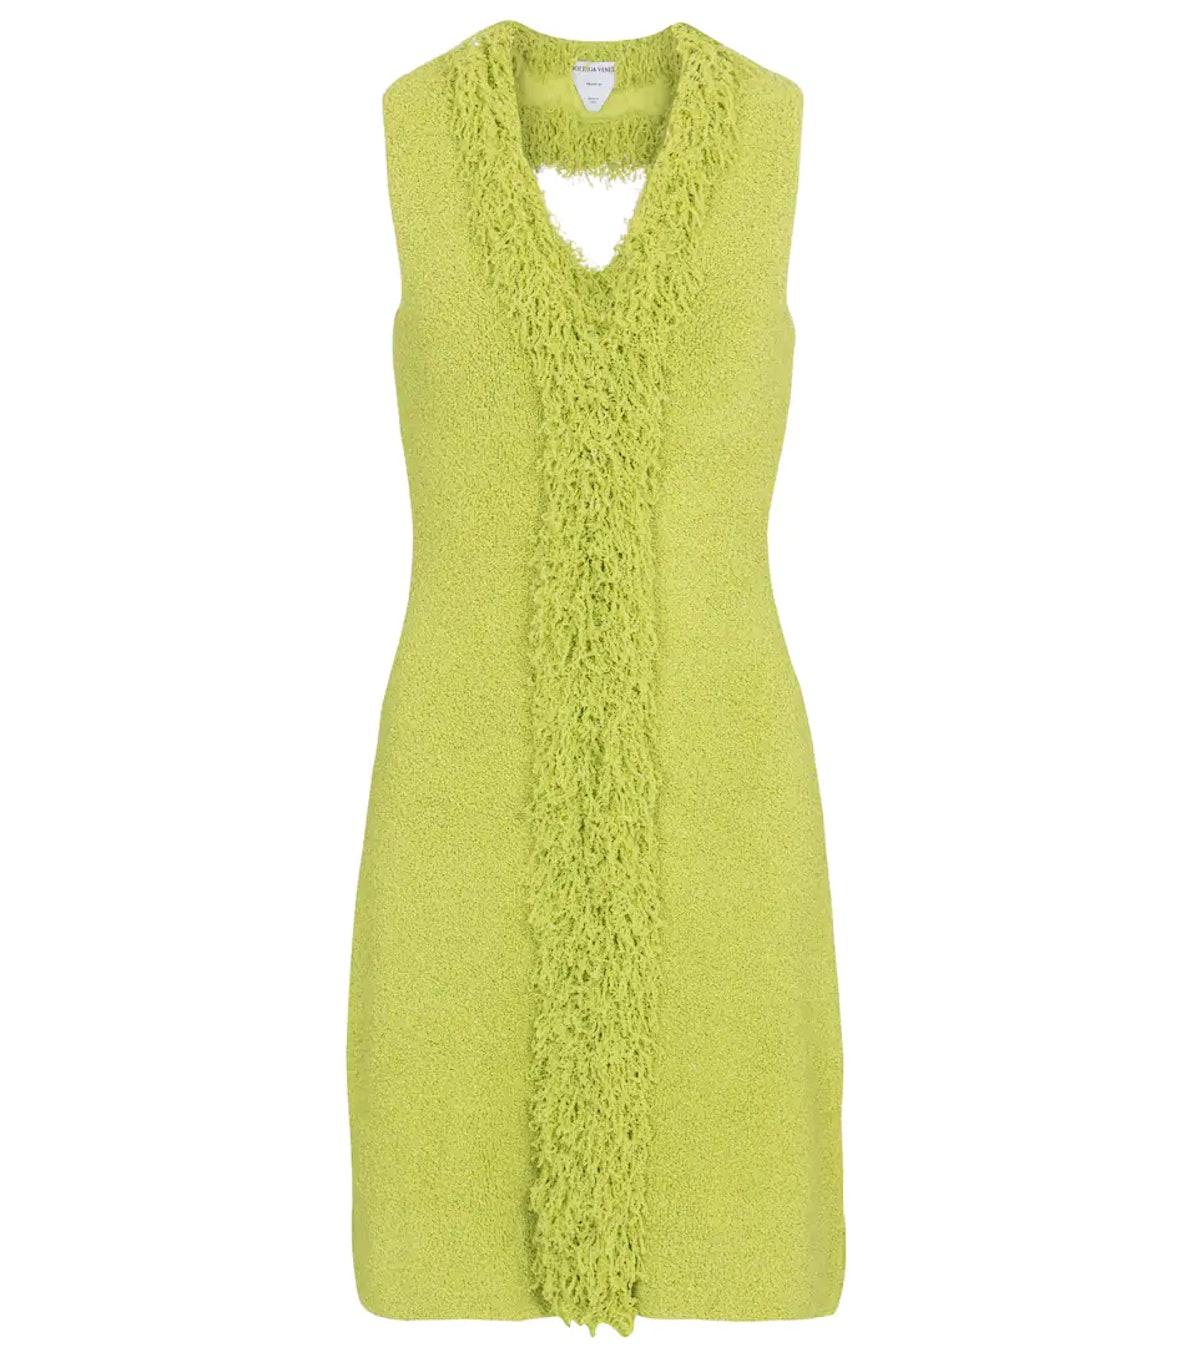 Green toweling knit dress from Bottega Veneta, available to shop on Mytheresa.